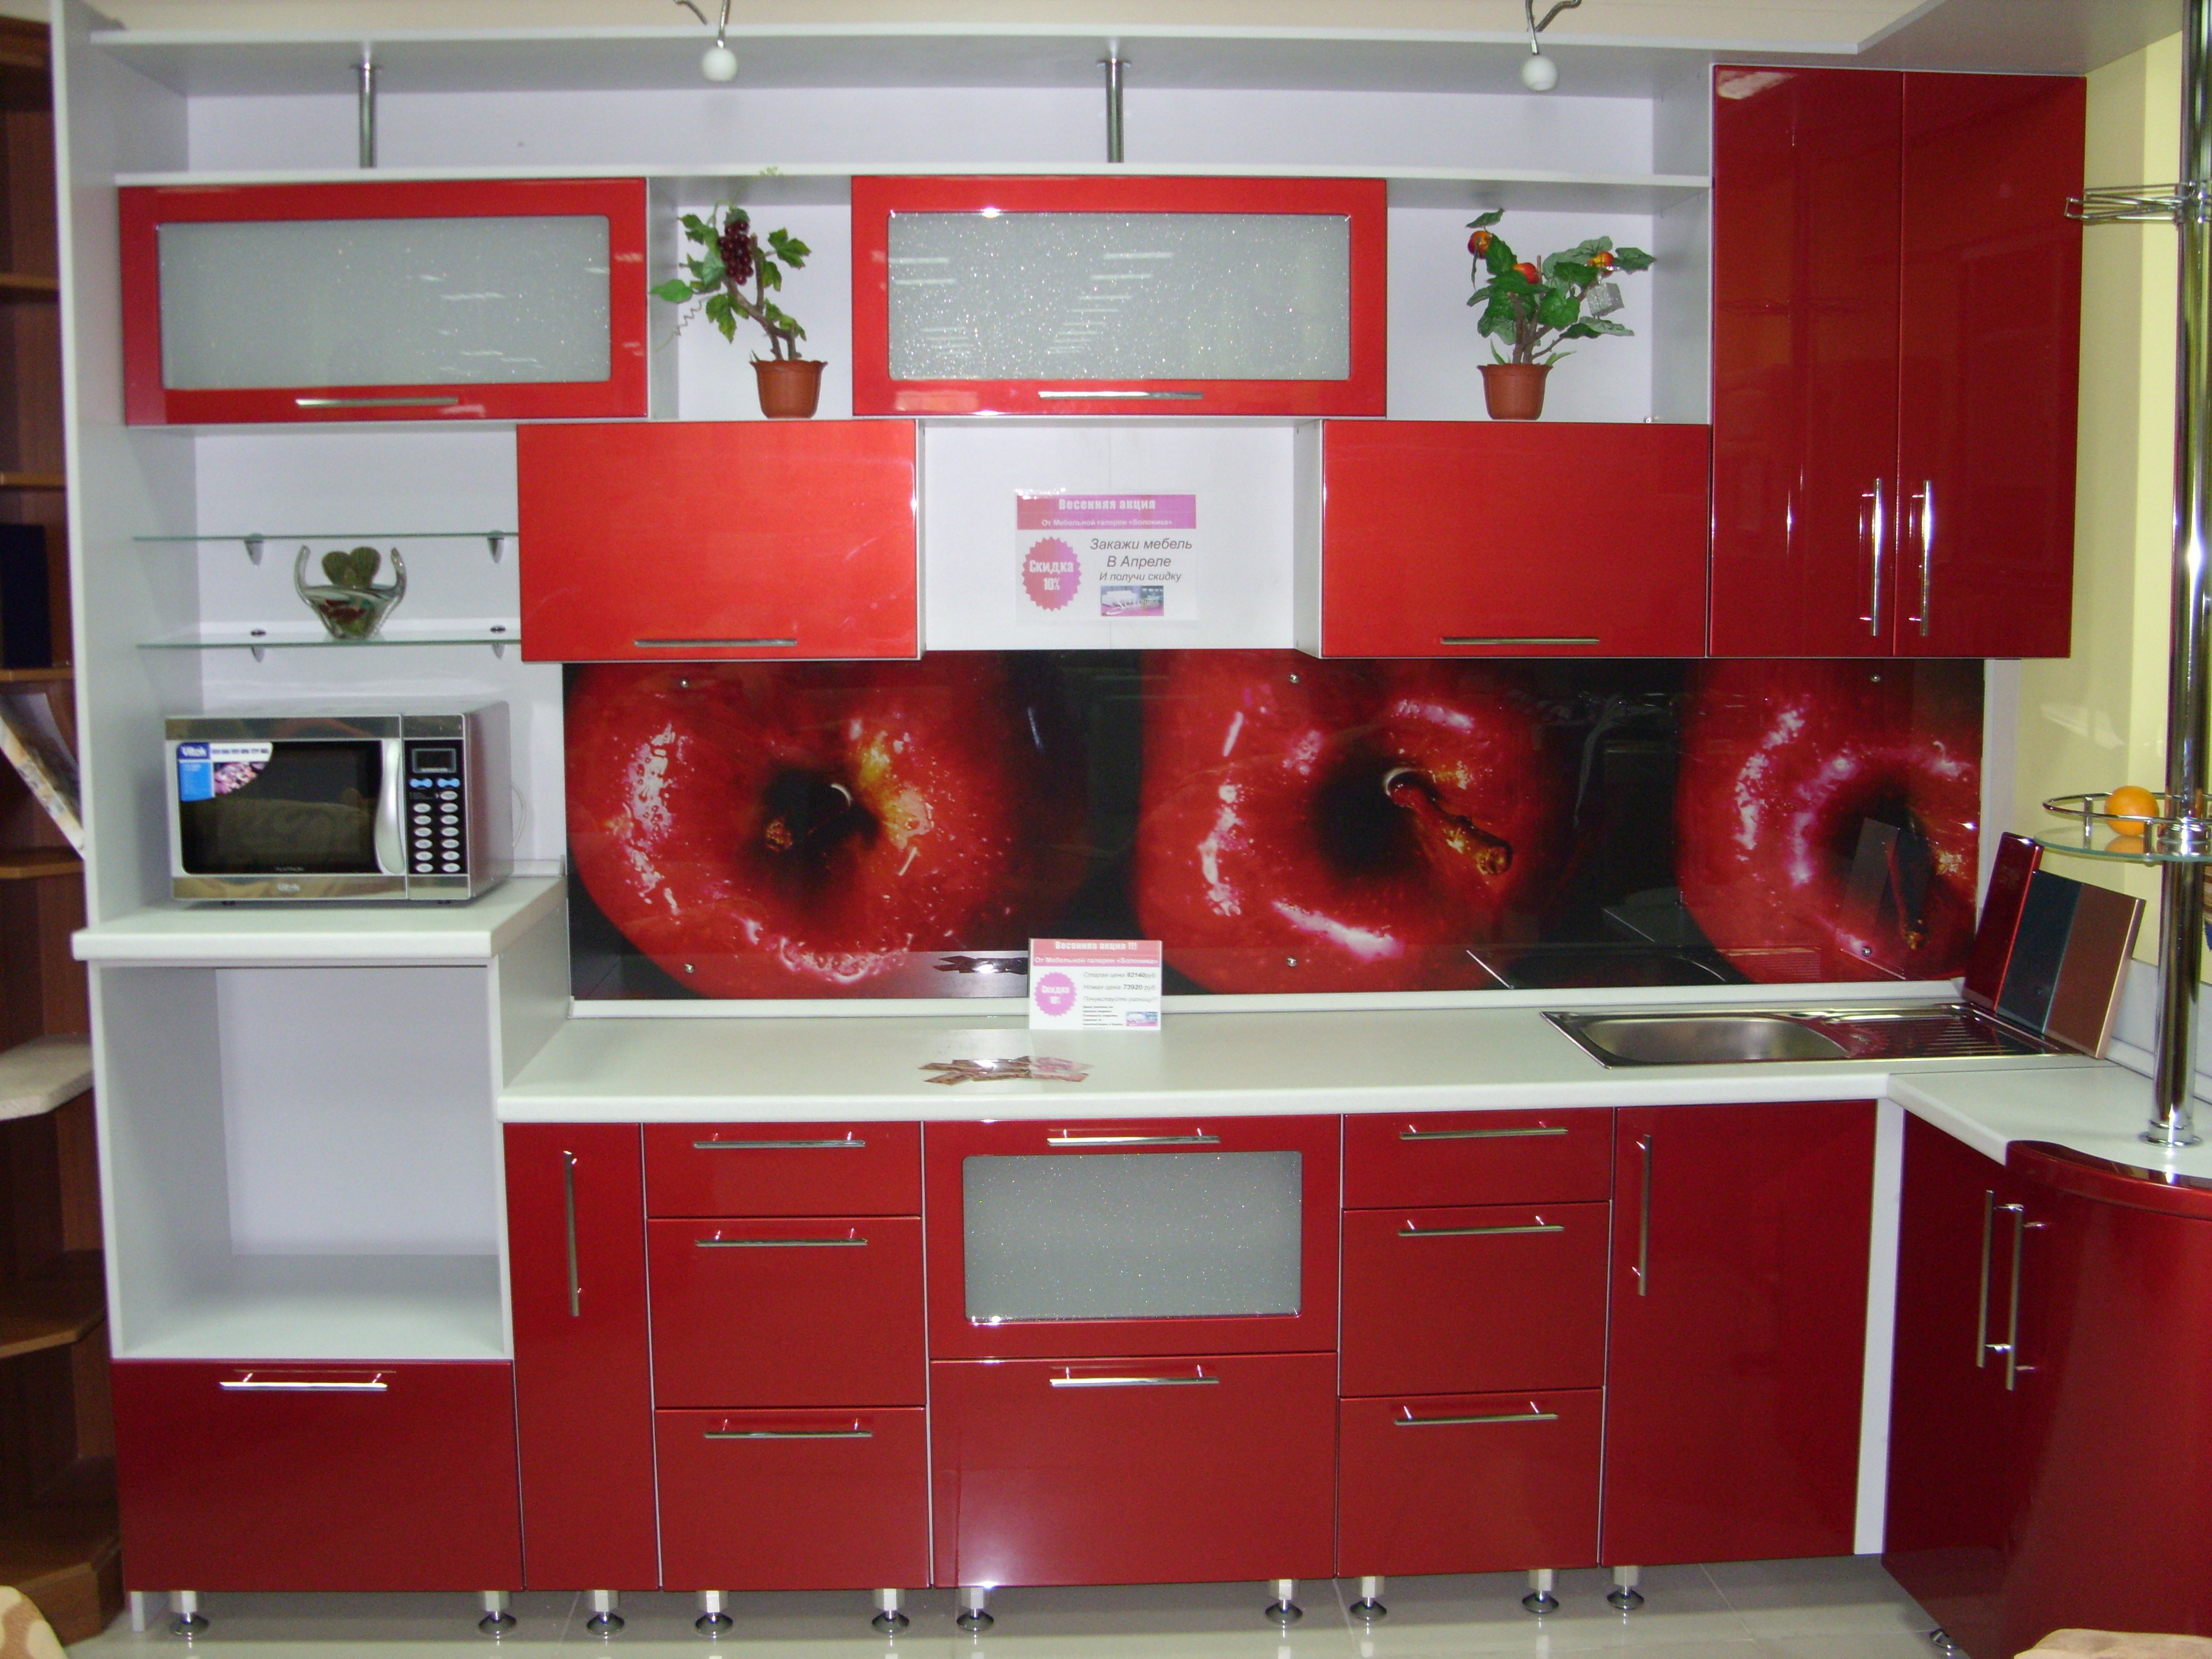 Солоника, мебельная галерея, барнаул - каталог * sibnet.